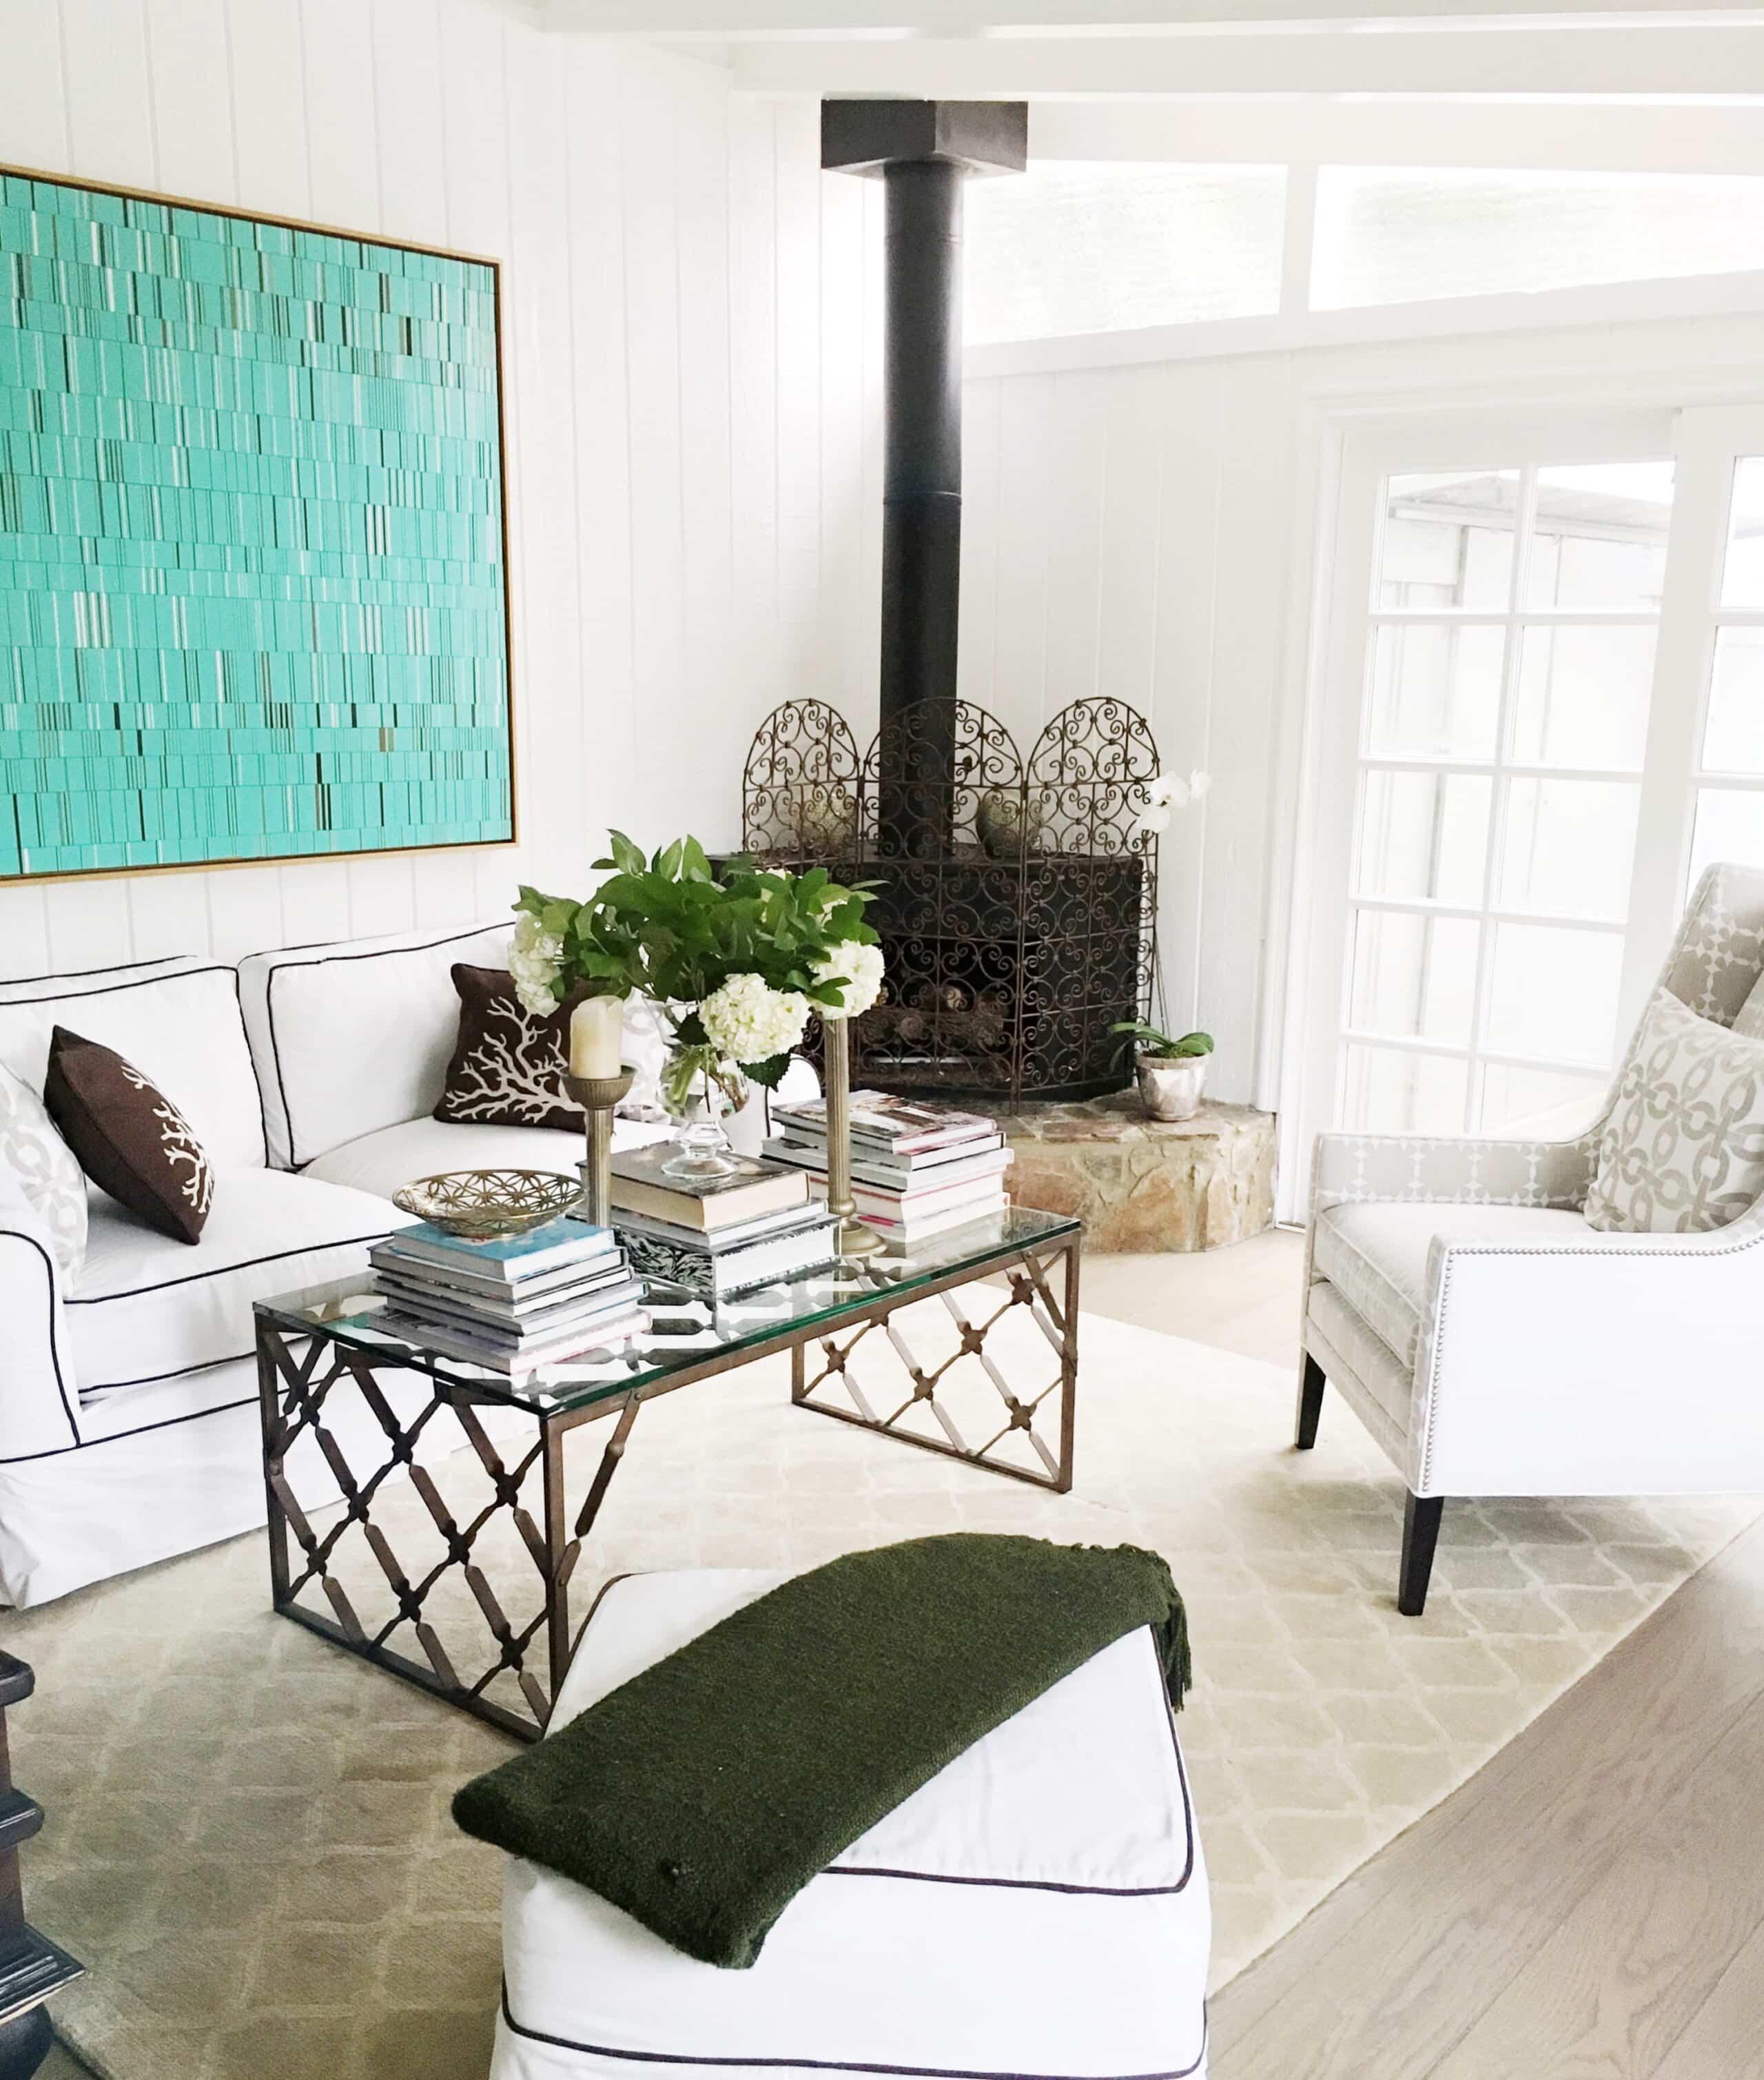 My Living Room Flower Arrangement Options